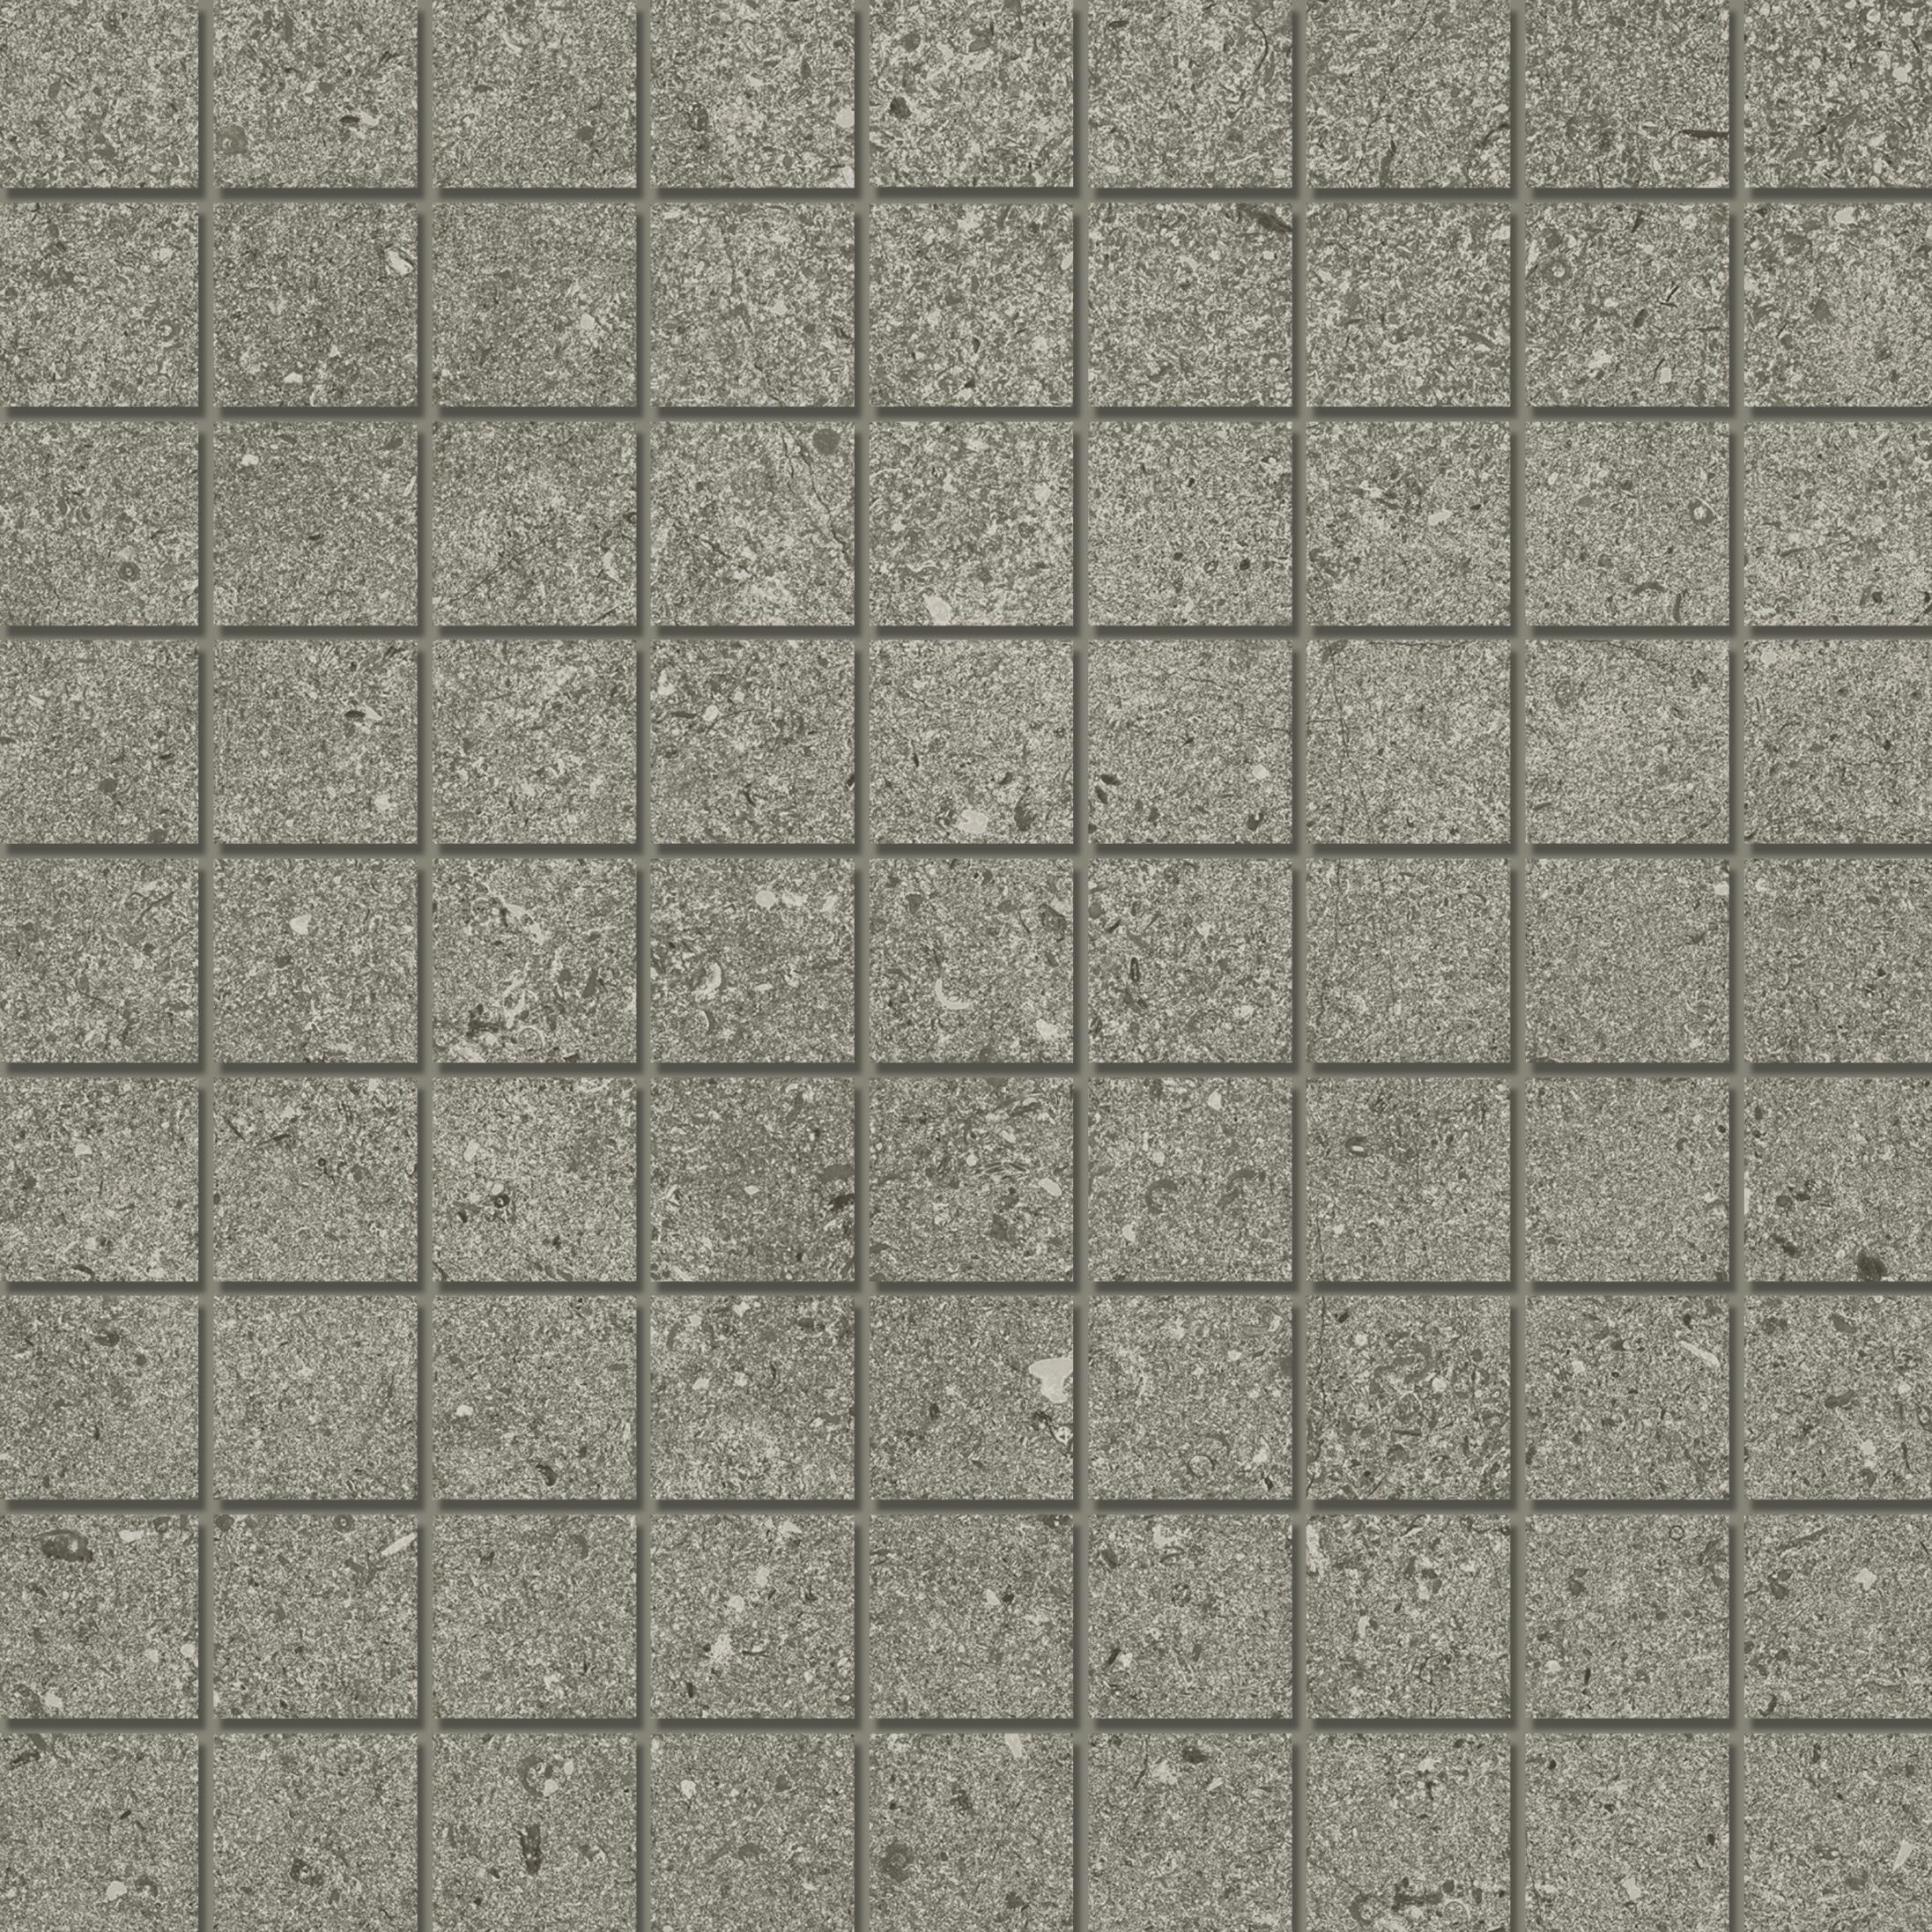 grau Mosaik, grey mosaic 30x30